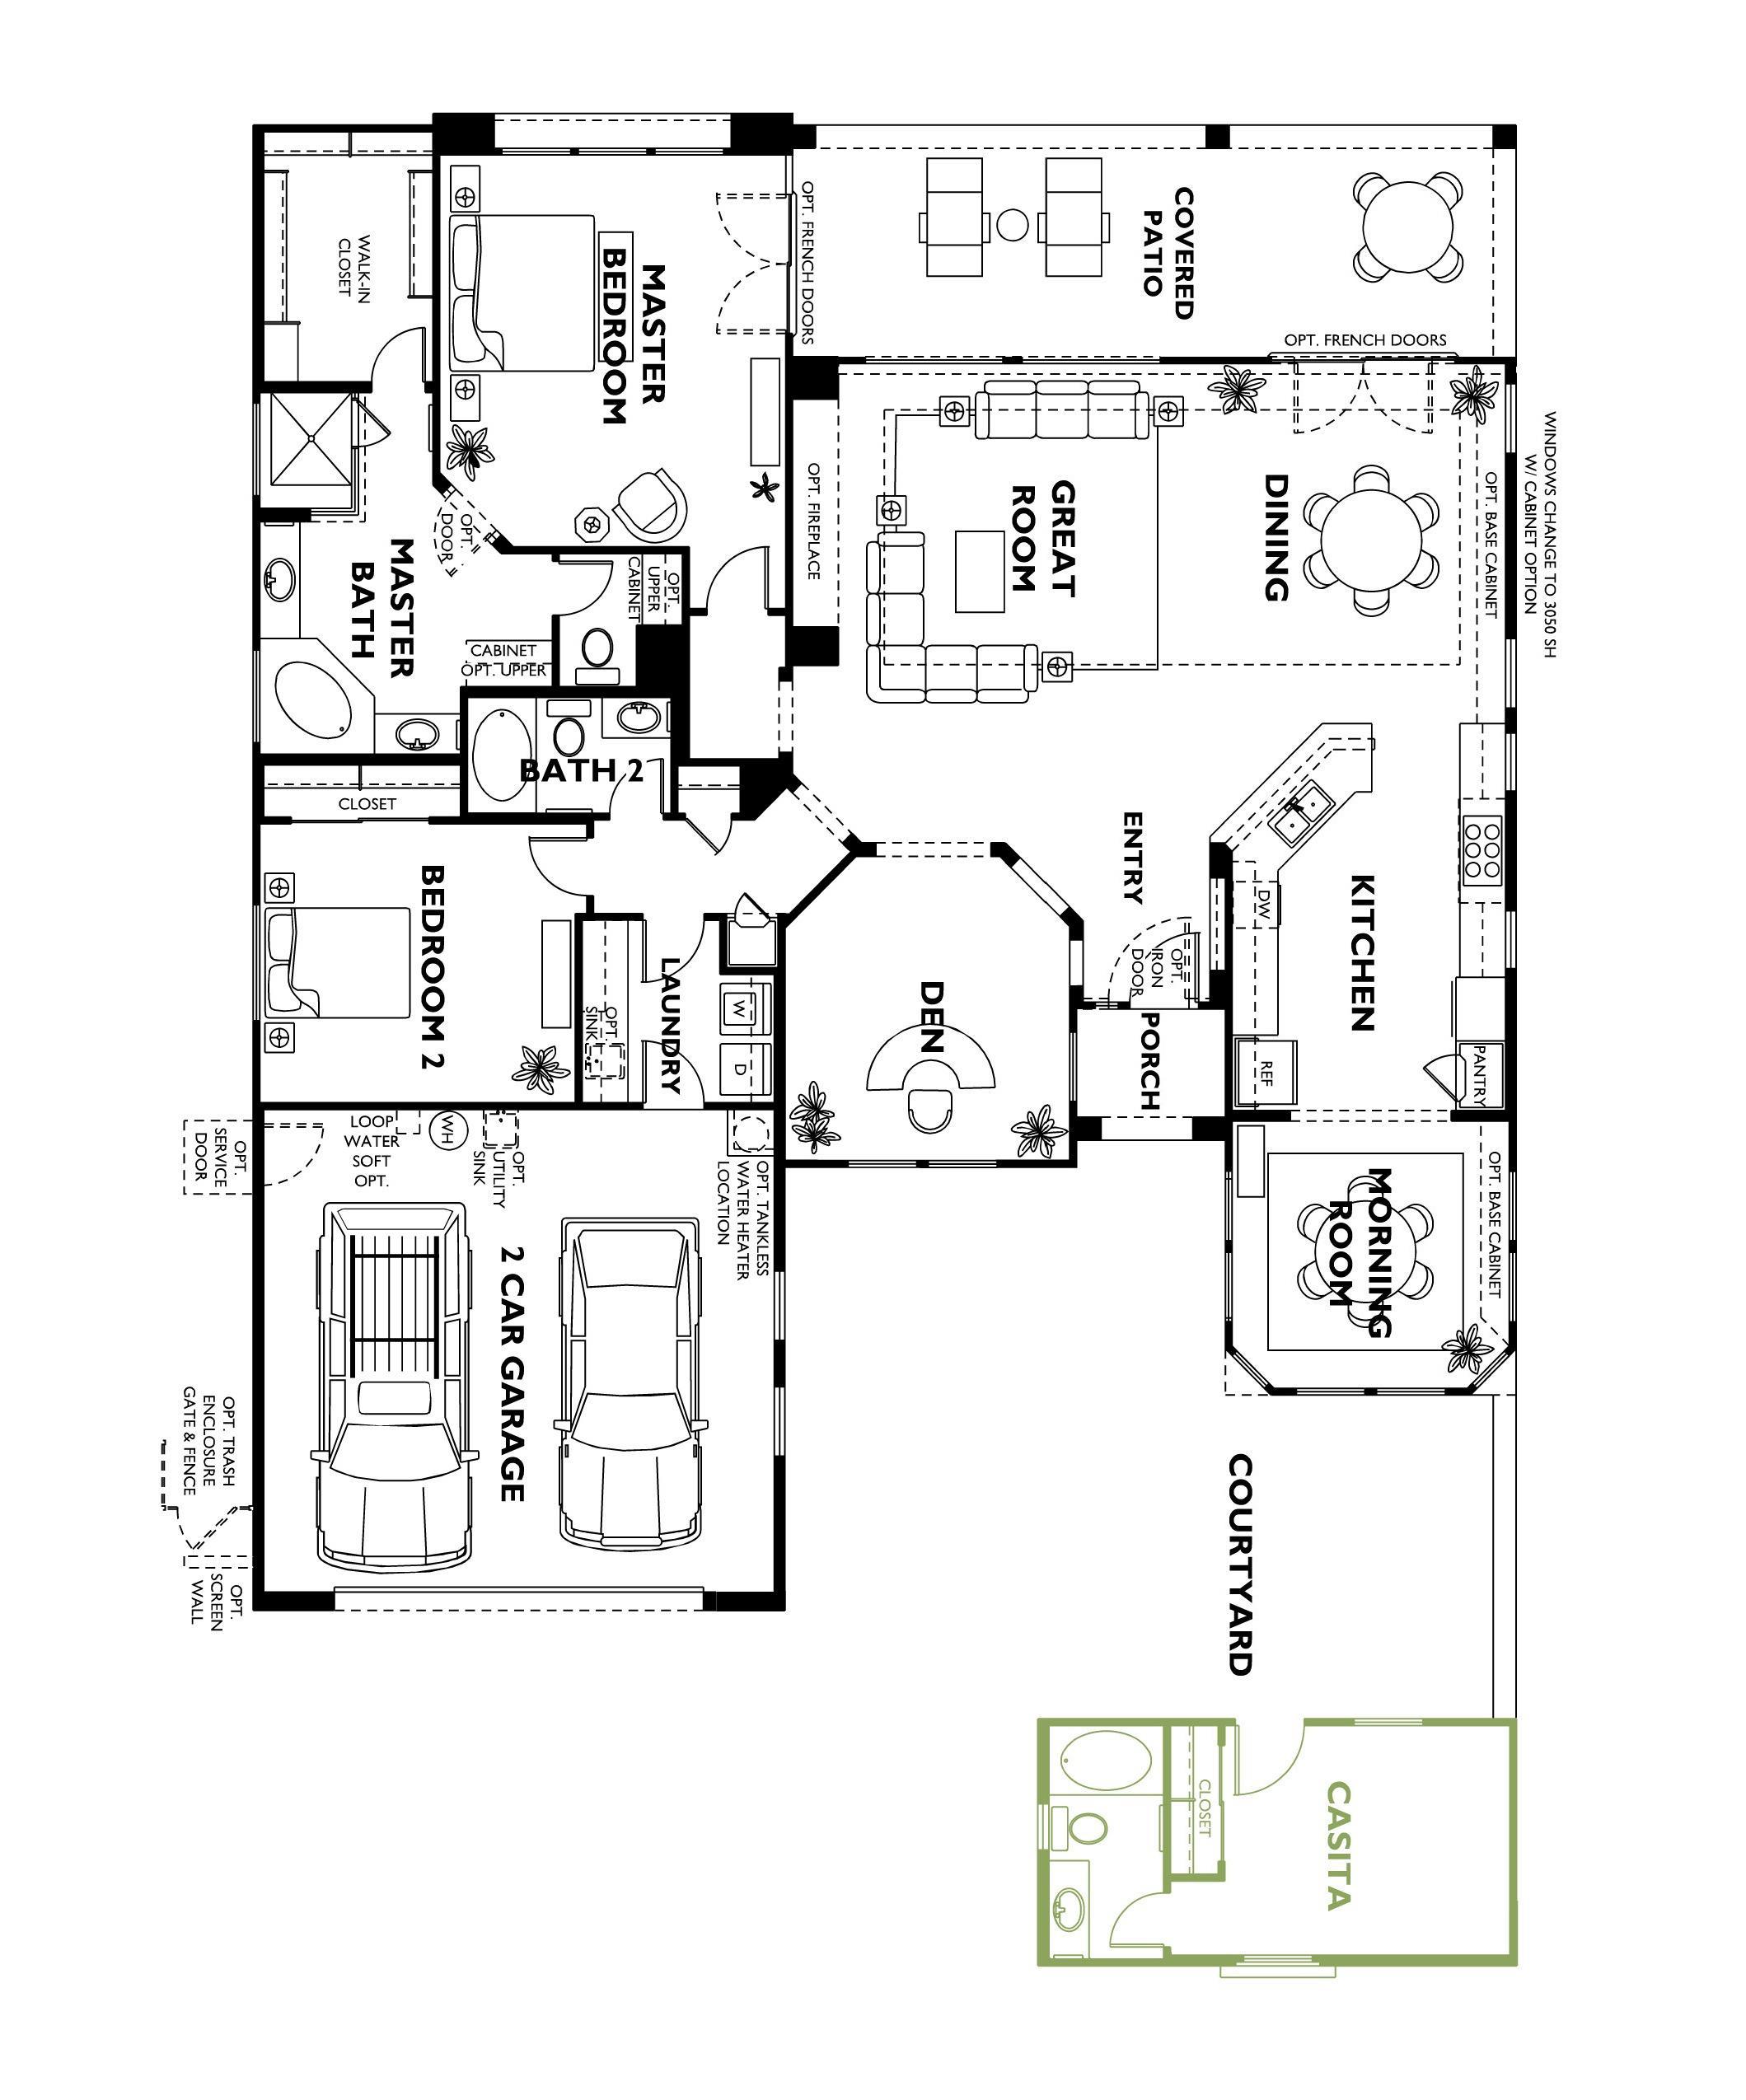 Trilogy At Vistancia Cadiz Floor Plan Model With Casita